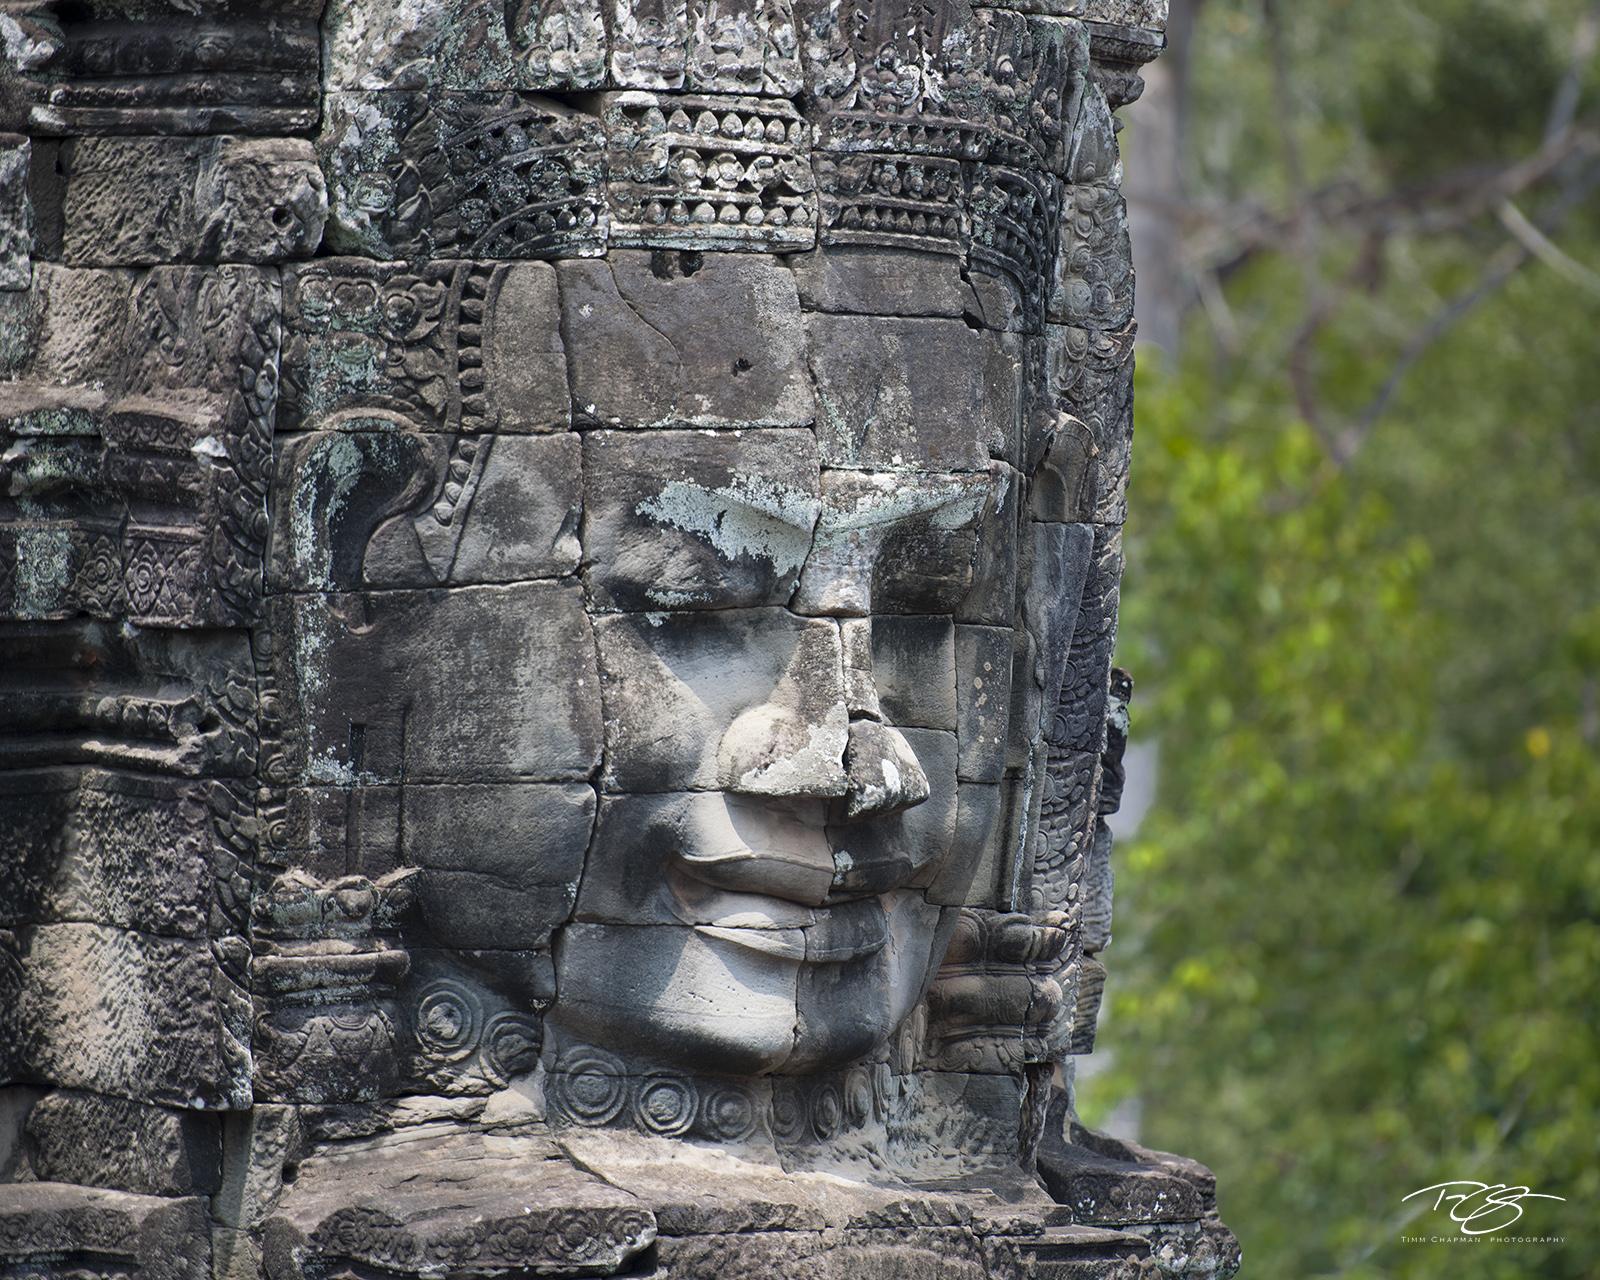 angkor wat, cambodia, temple, bayon, harmony, harmonious, Avalokiteshvara, carving, stone, sculpture, ancient, buddha, buddhism, buddhist, smiling buddha, at peace, peace, tranquility, solace, contemp, photo